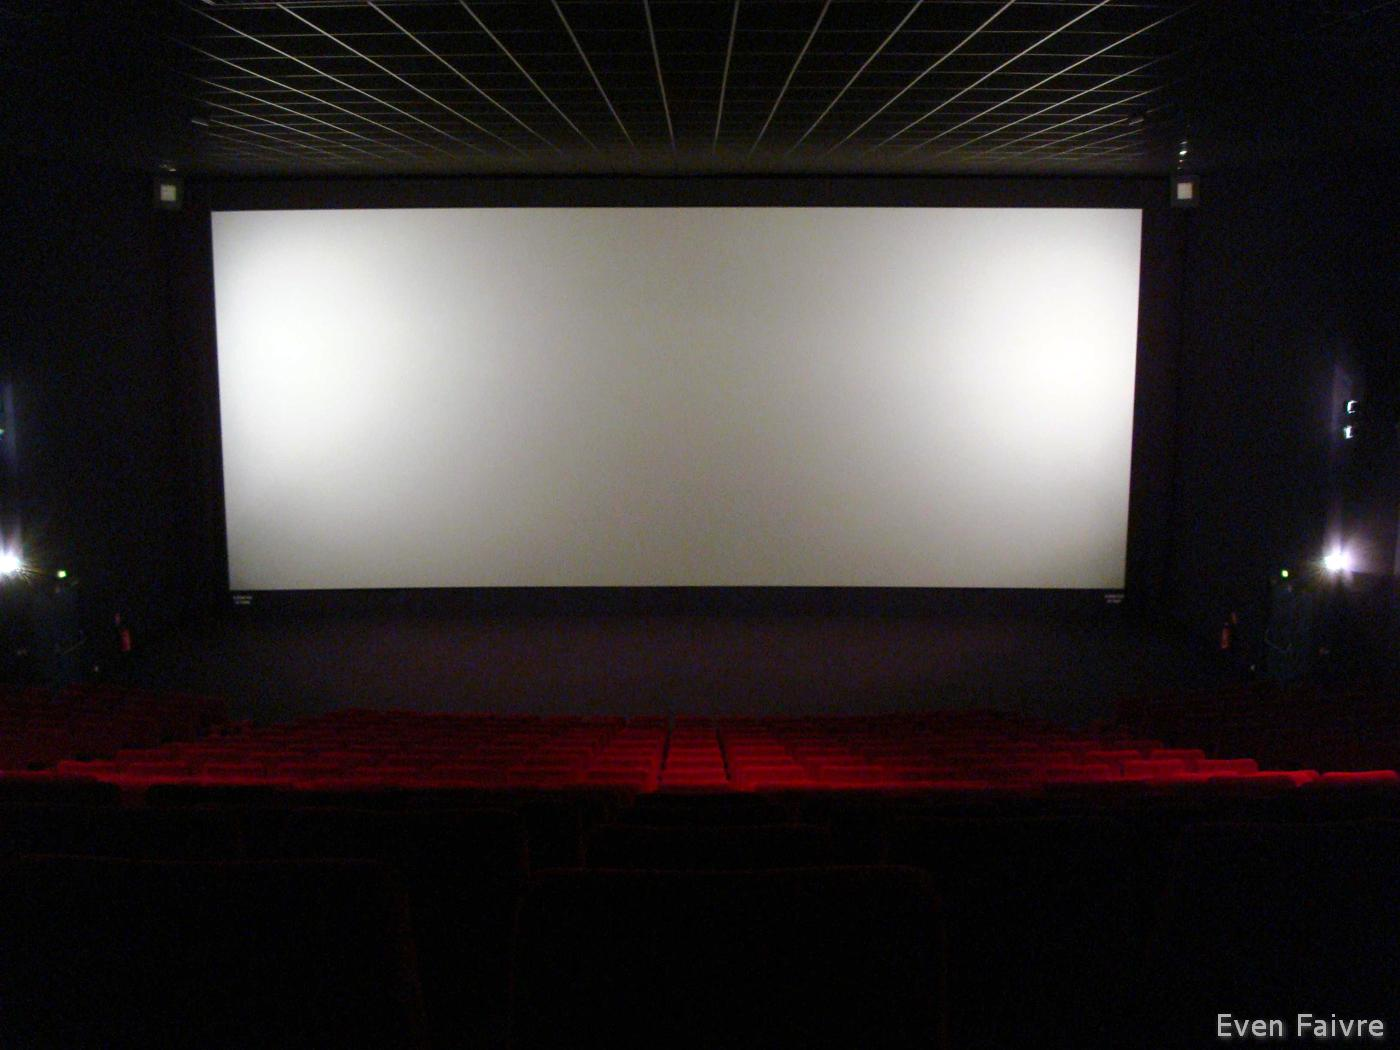 Cinema multiplexe libert brest 29 for Ecran image